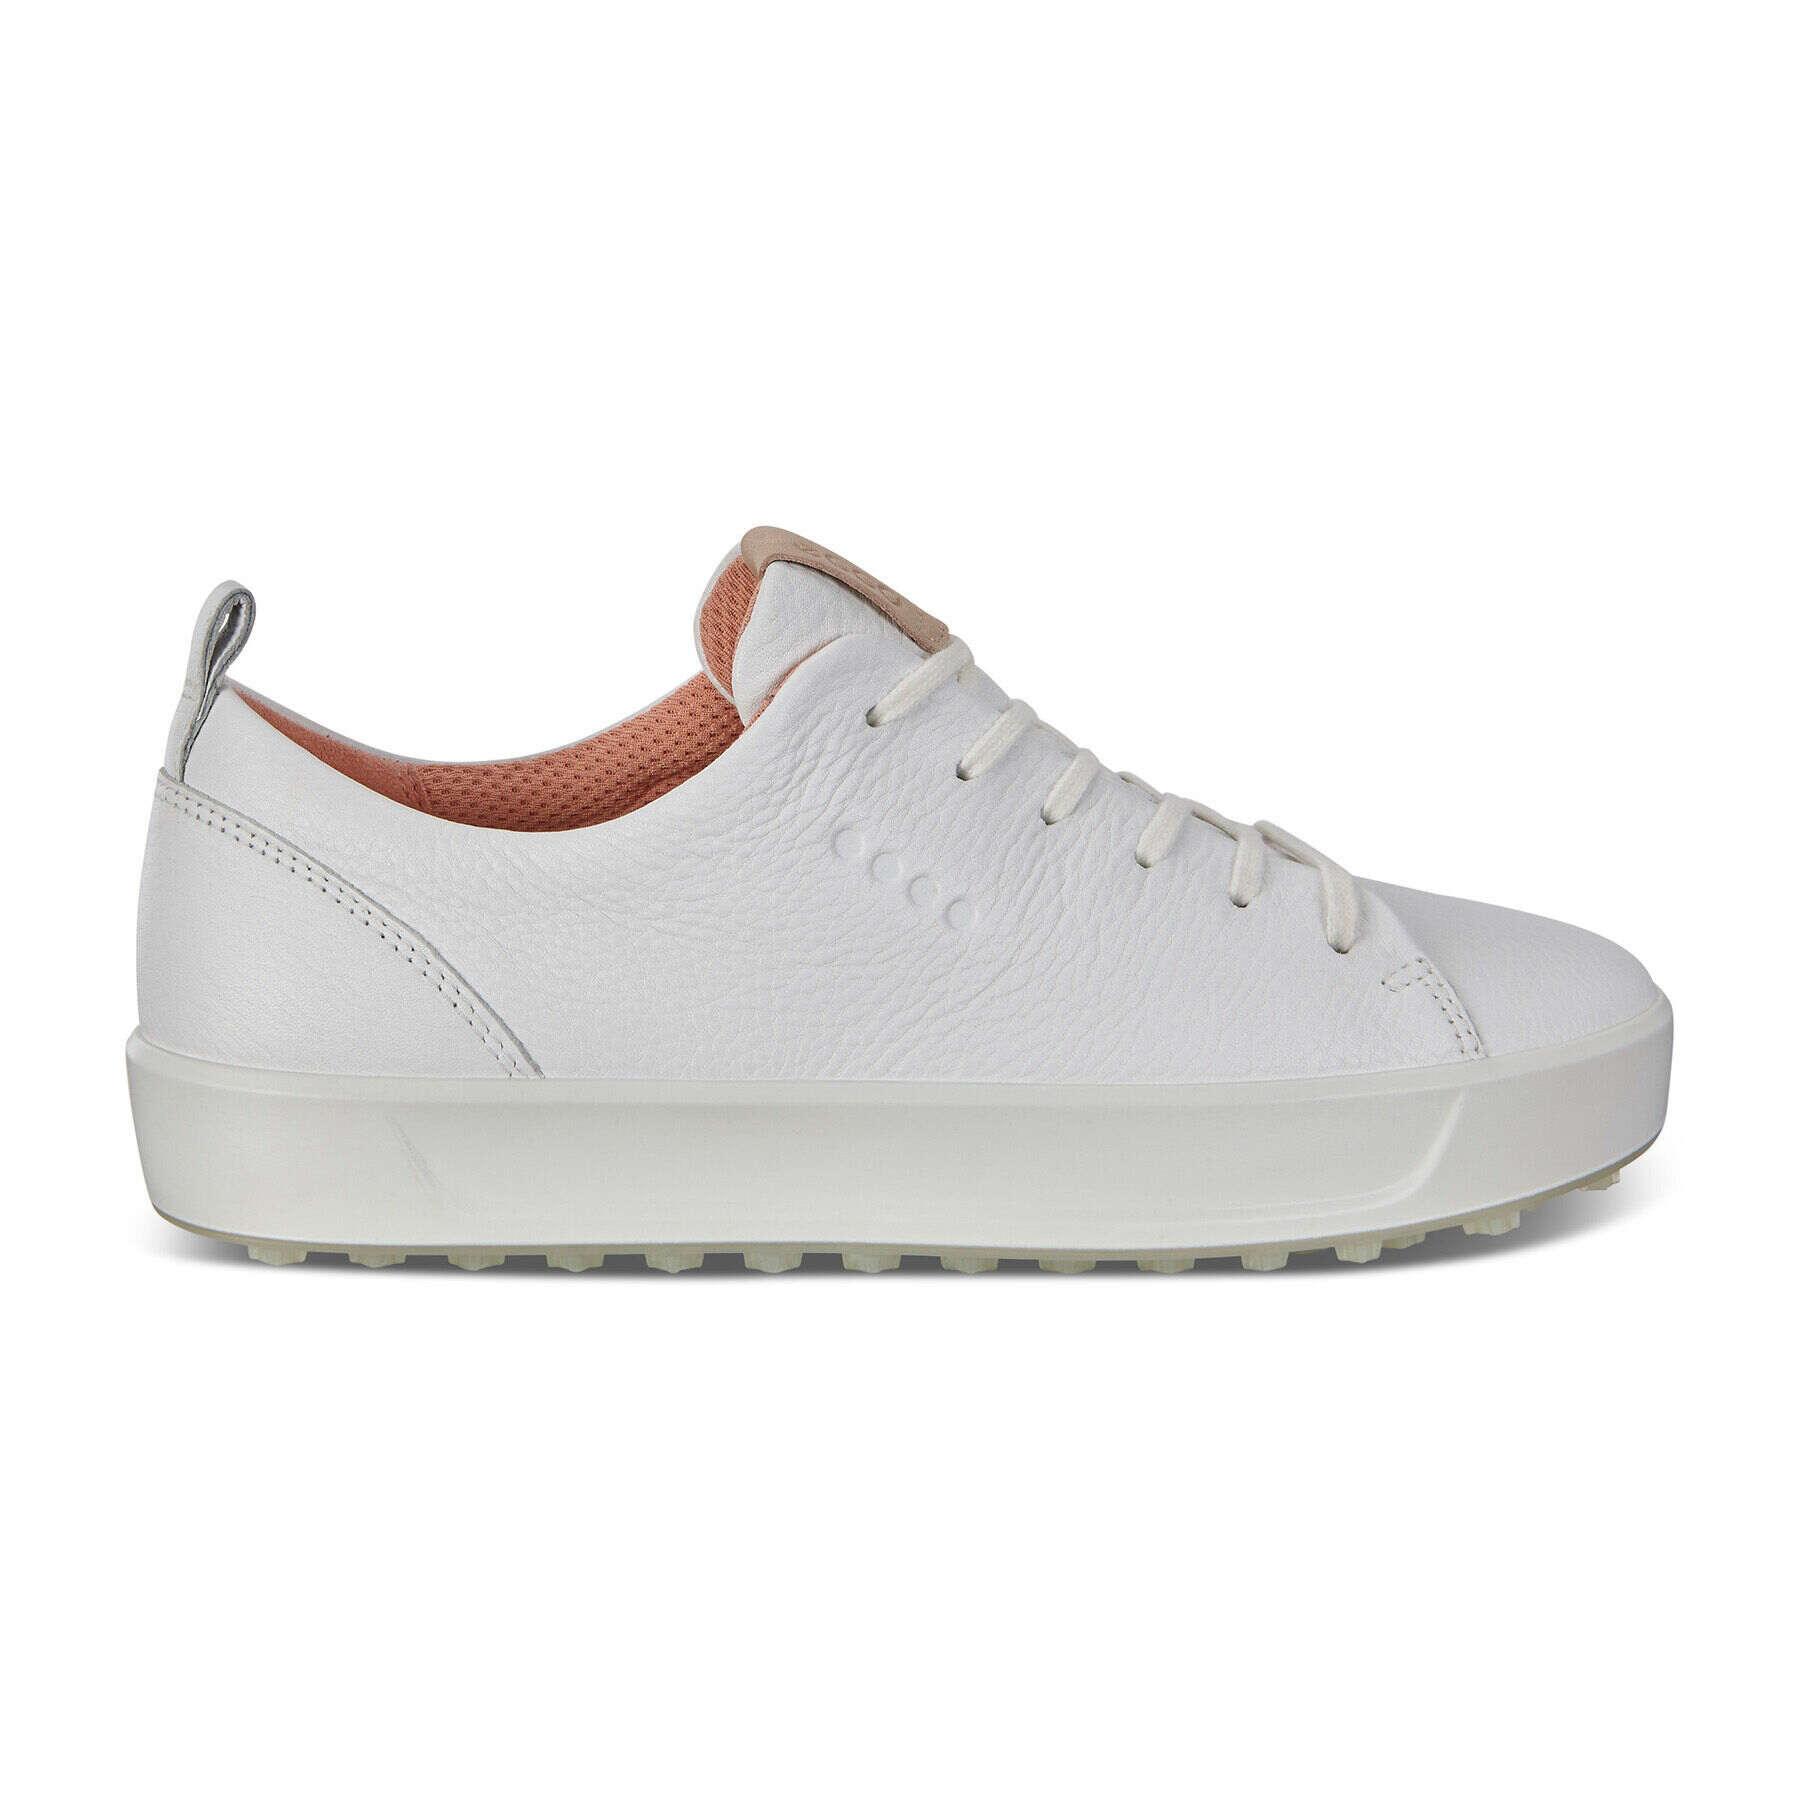 ECCO Golf Soft Low Women's Golf Shoe